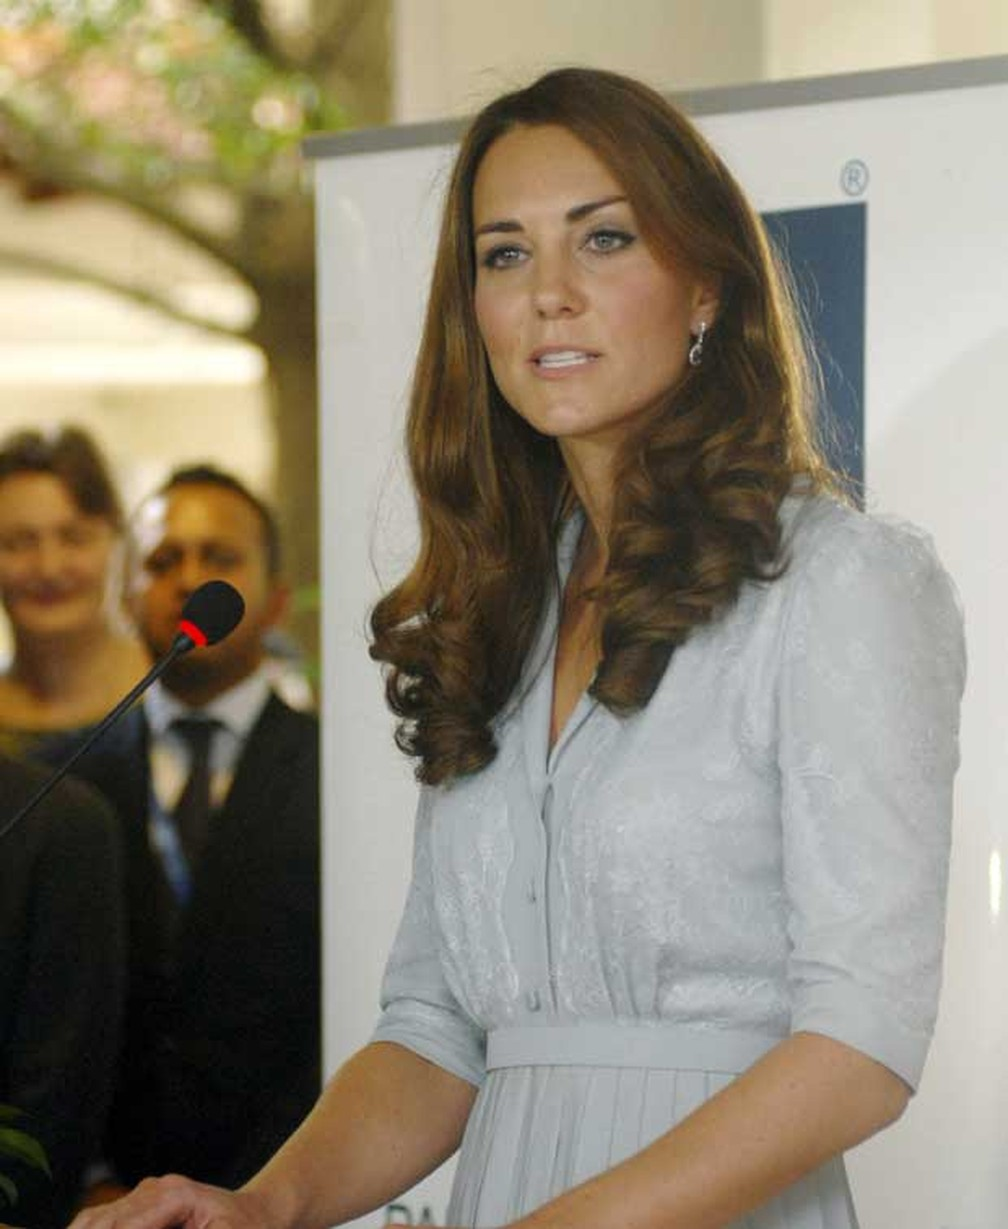 A britânica Kate Middleton, duquesa de Cambridge, apresenta discurso em Kuala Lumpur, Malásia, nesta quinta-feira (13) — Foto: AP